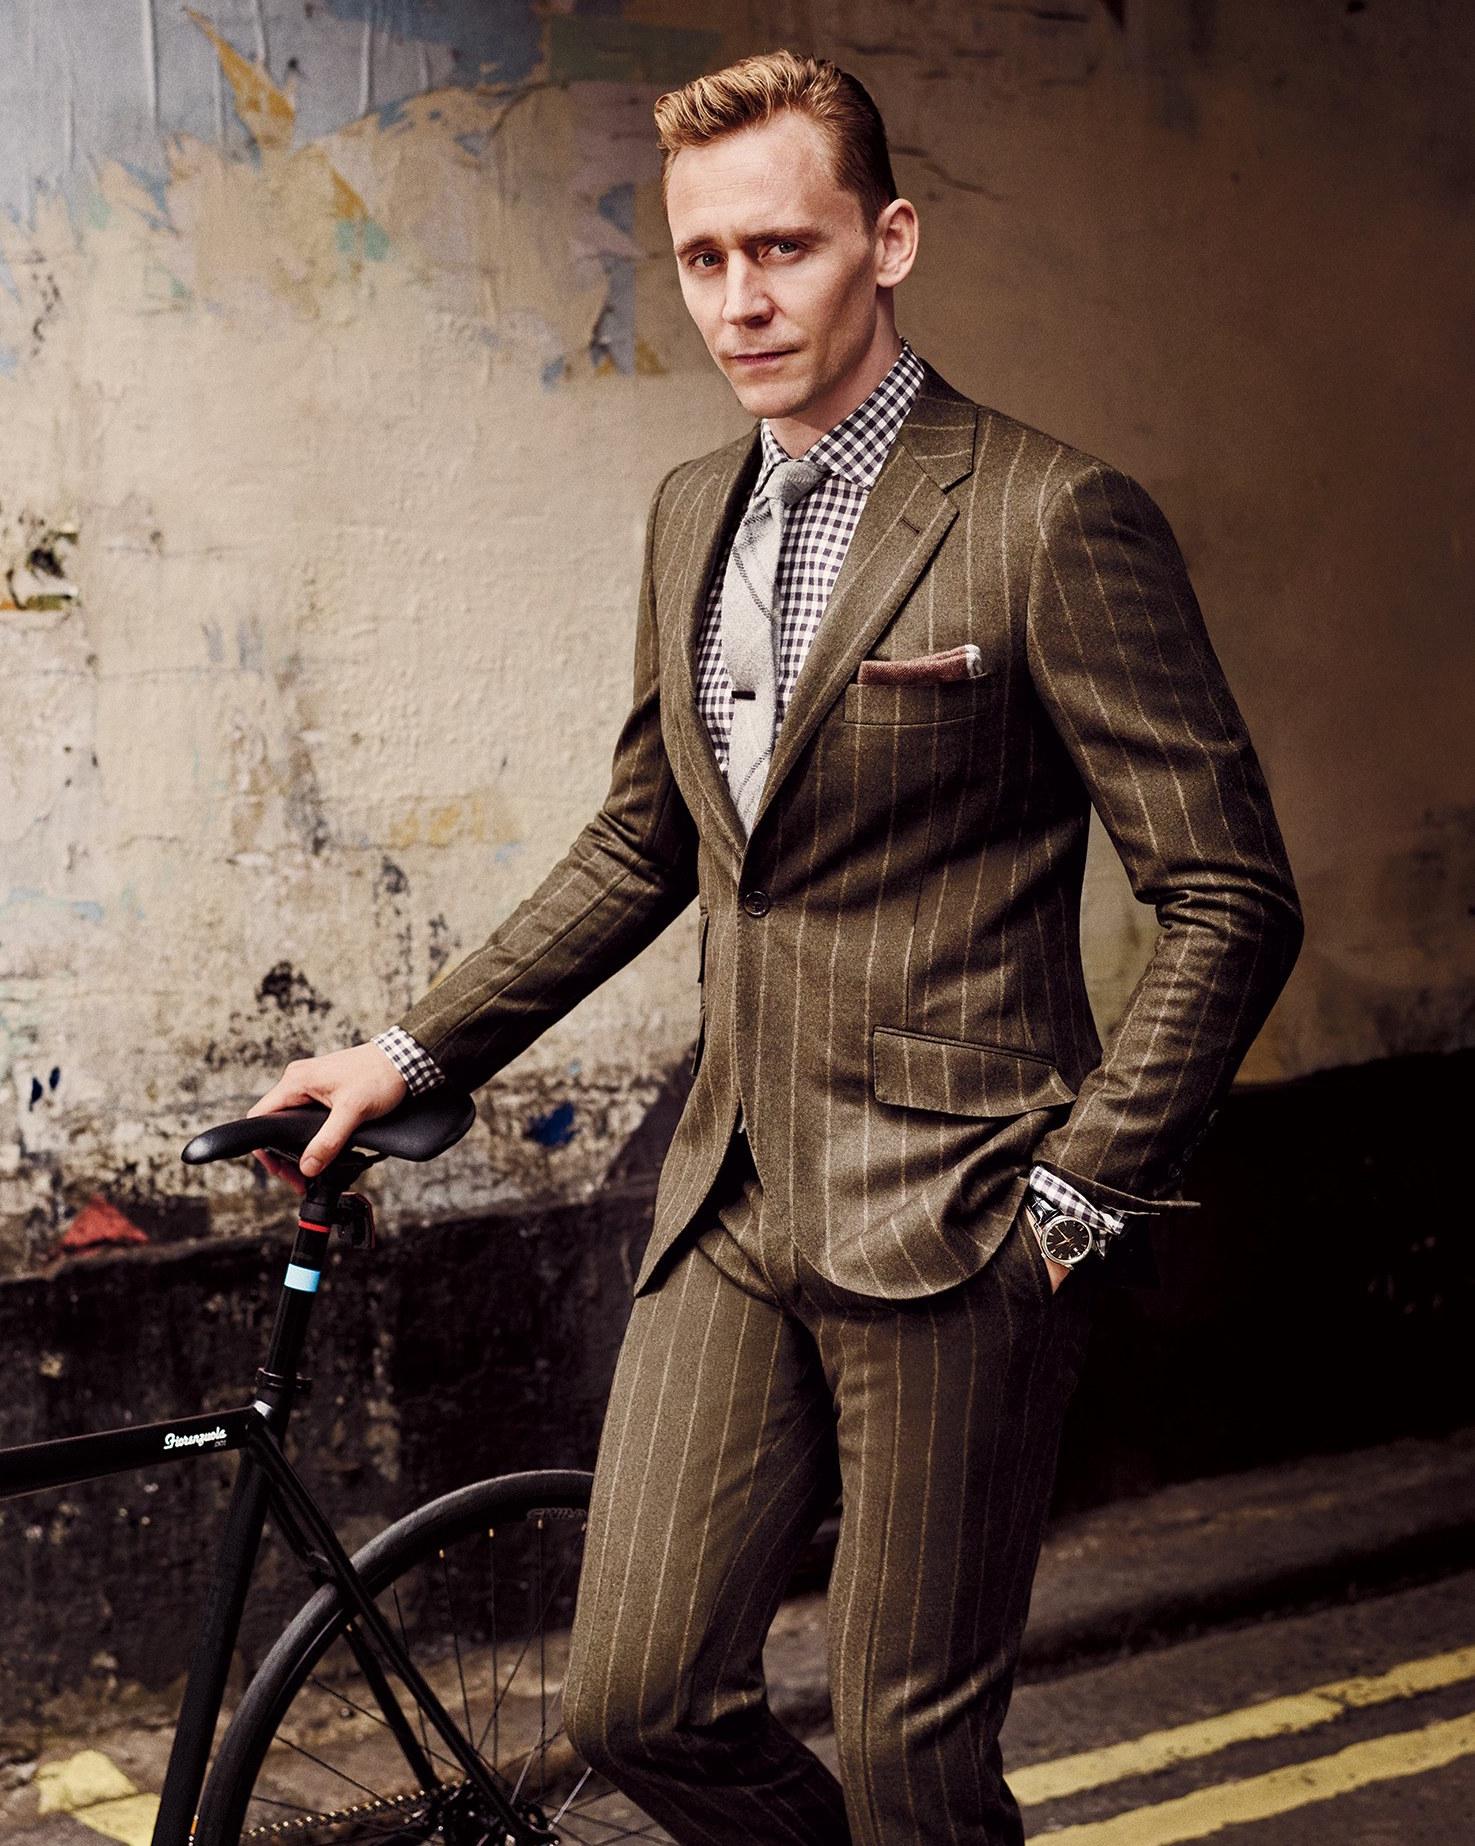 Tom Hiddleston James Bond MovieSpoon.com